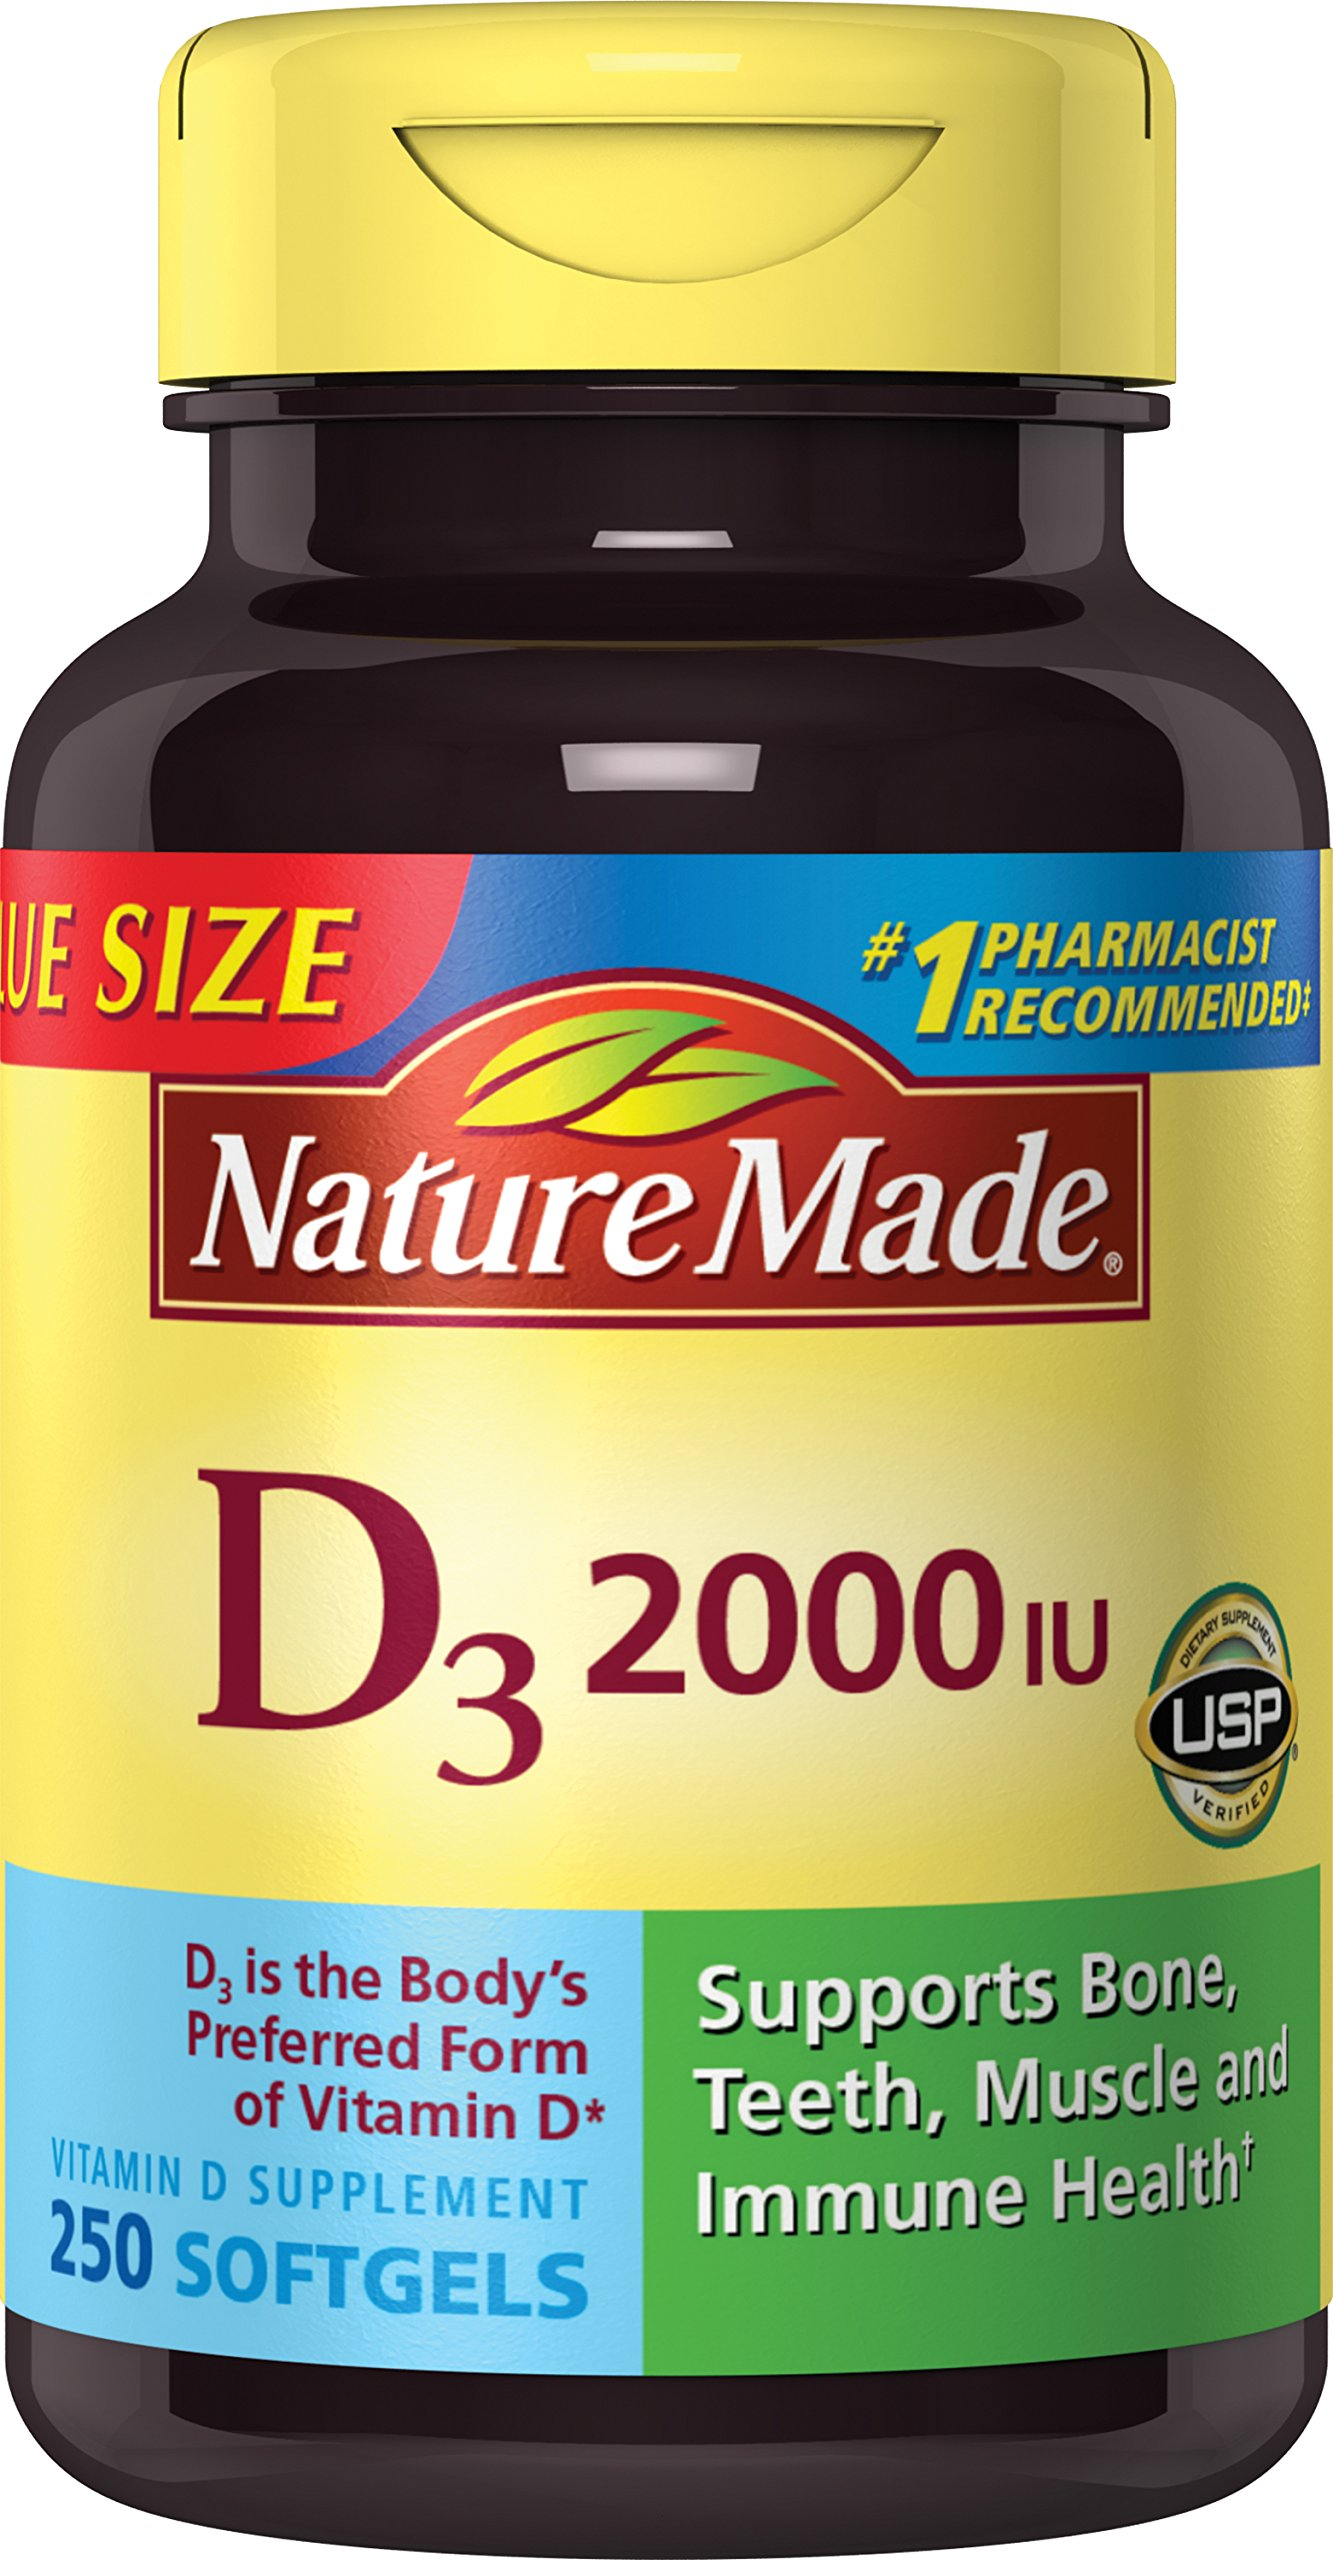 Nature Made Vitamin D3 2000 IU Softgels Value Size 250 Ct